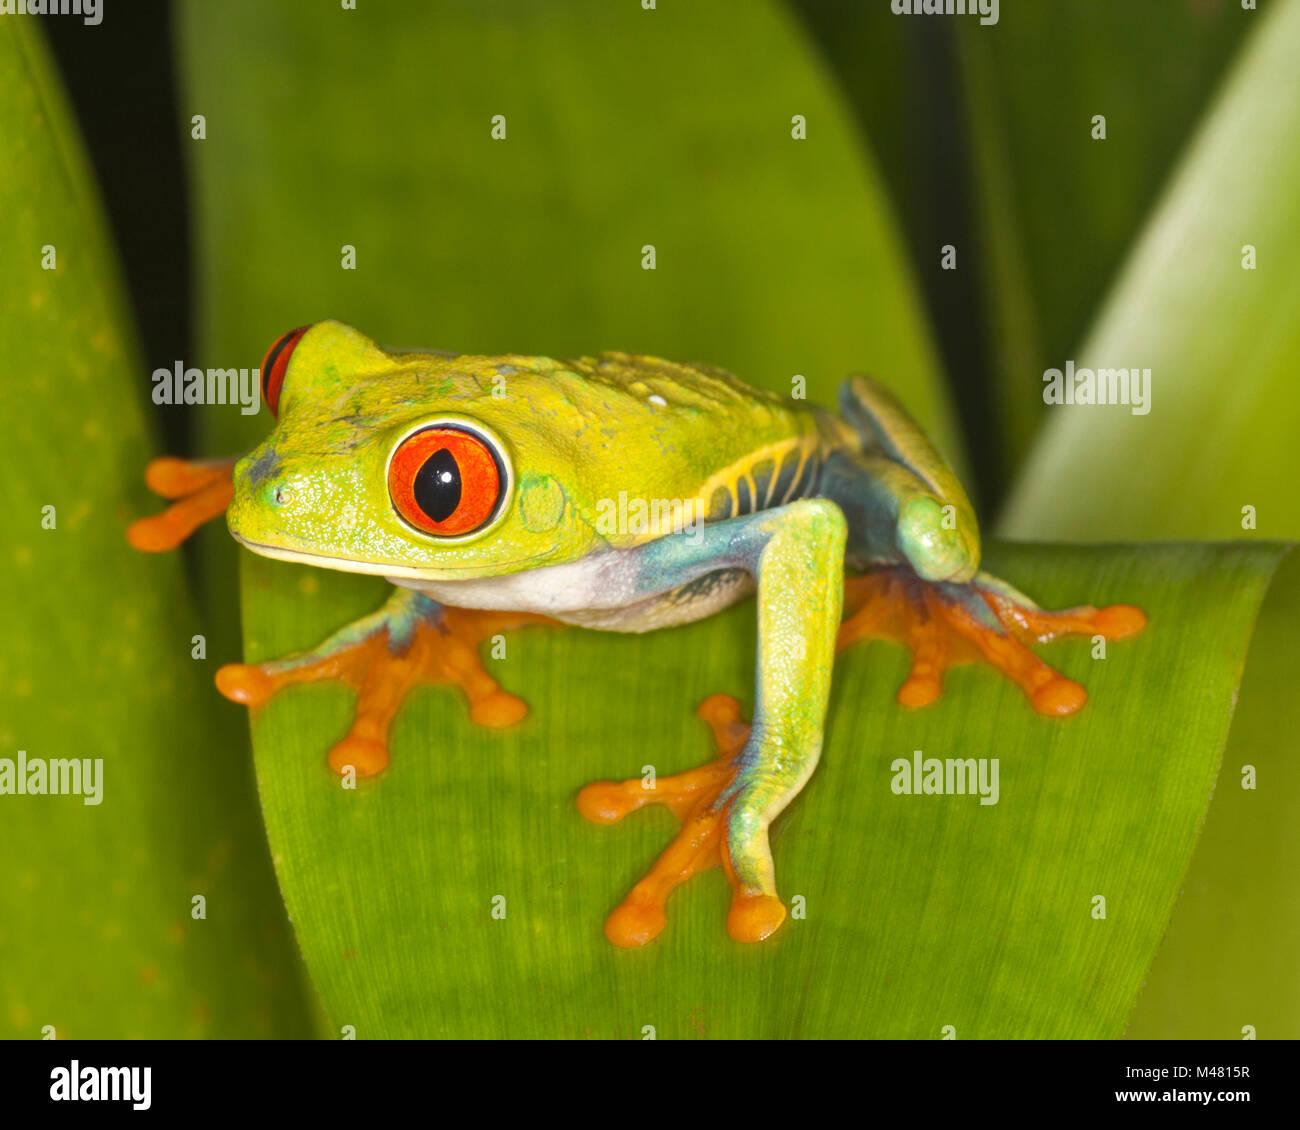 Red-eyed Tree frog (Agalychnis callidryas)on rainforest leaf, also known as Red-eye Leaf Frog - Stock Image